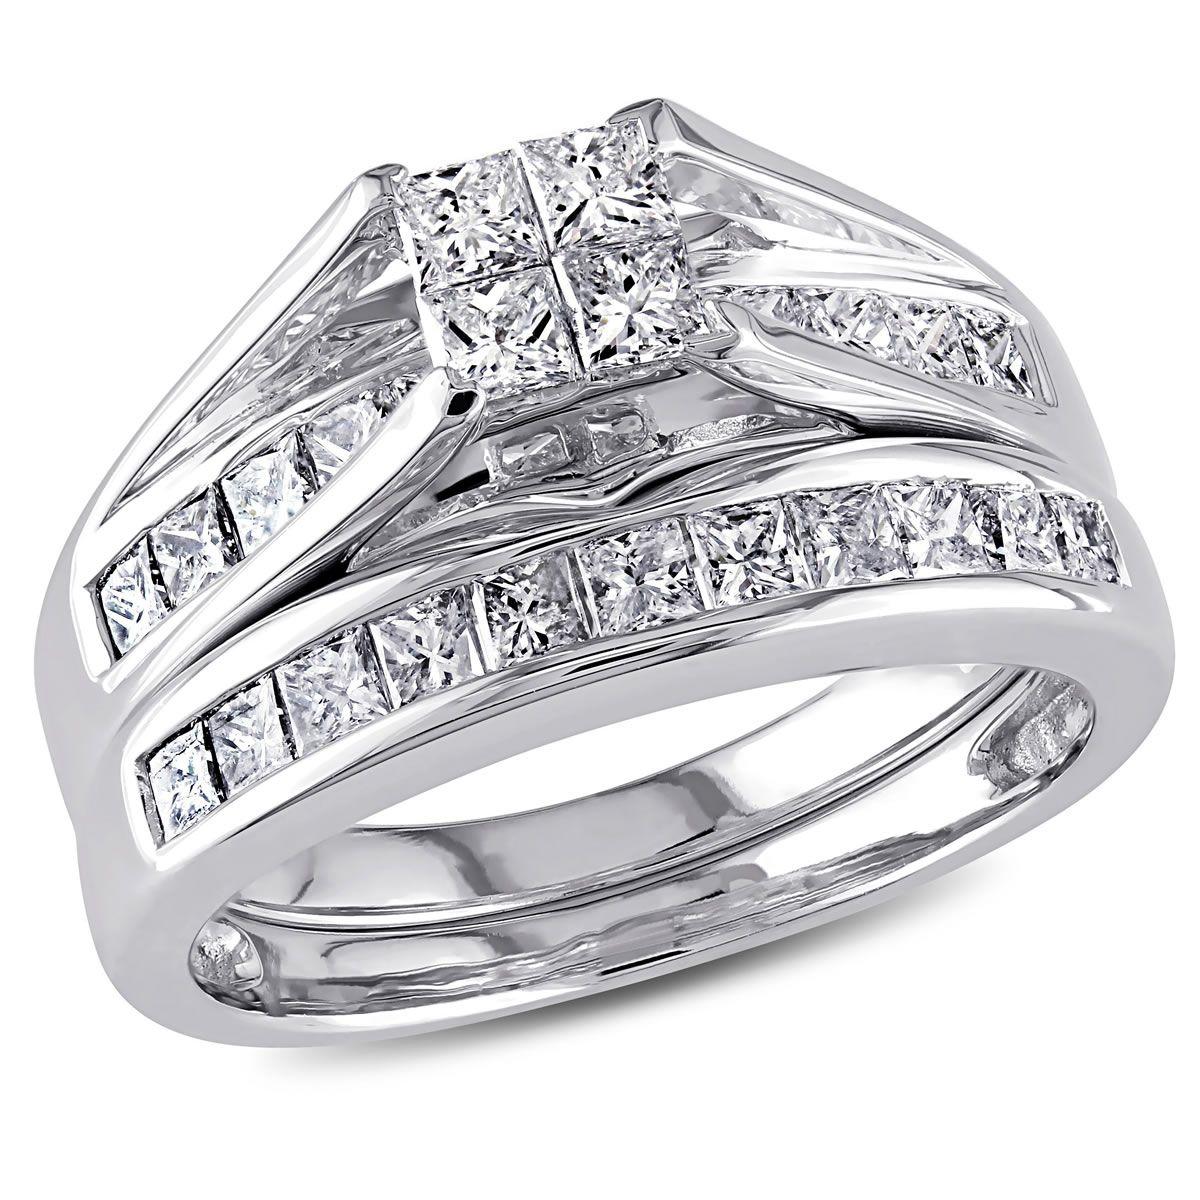 Diamond and Weddings